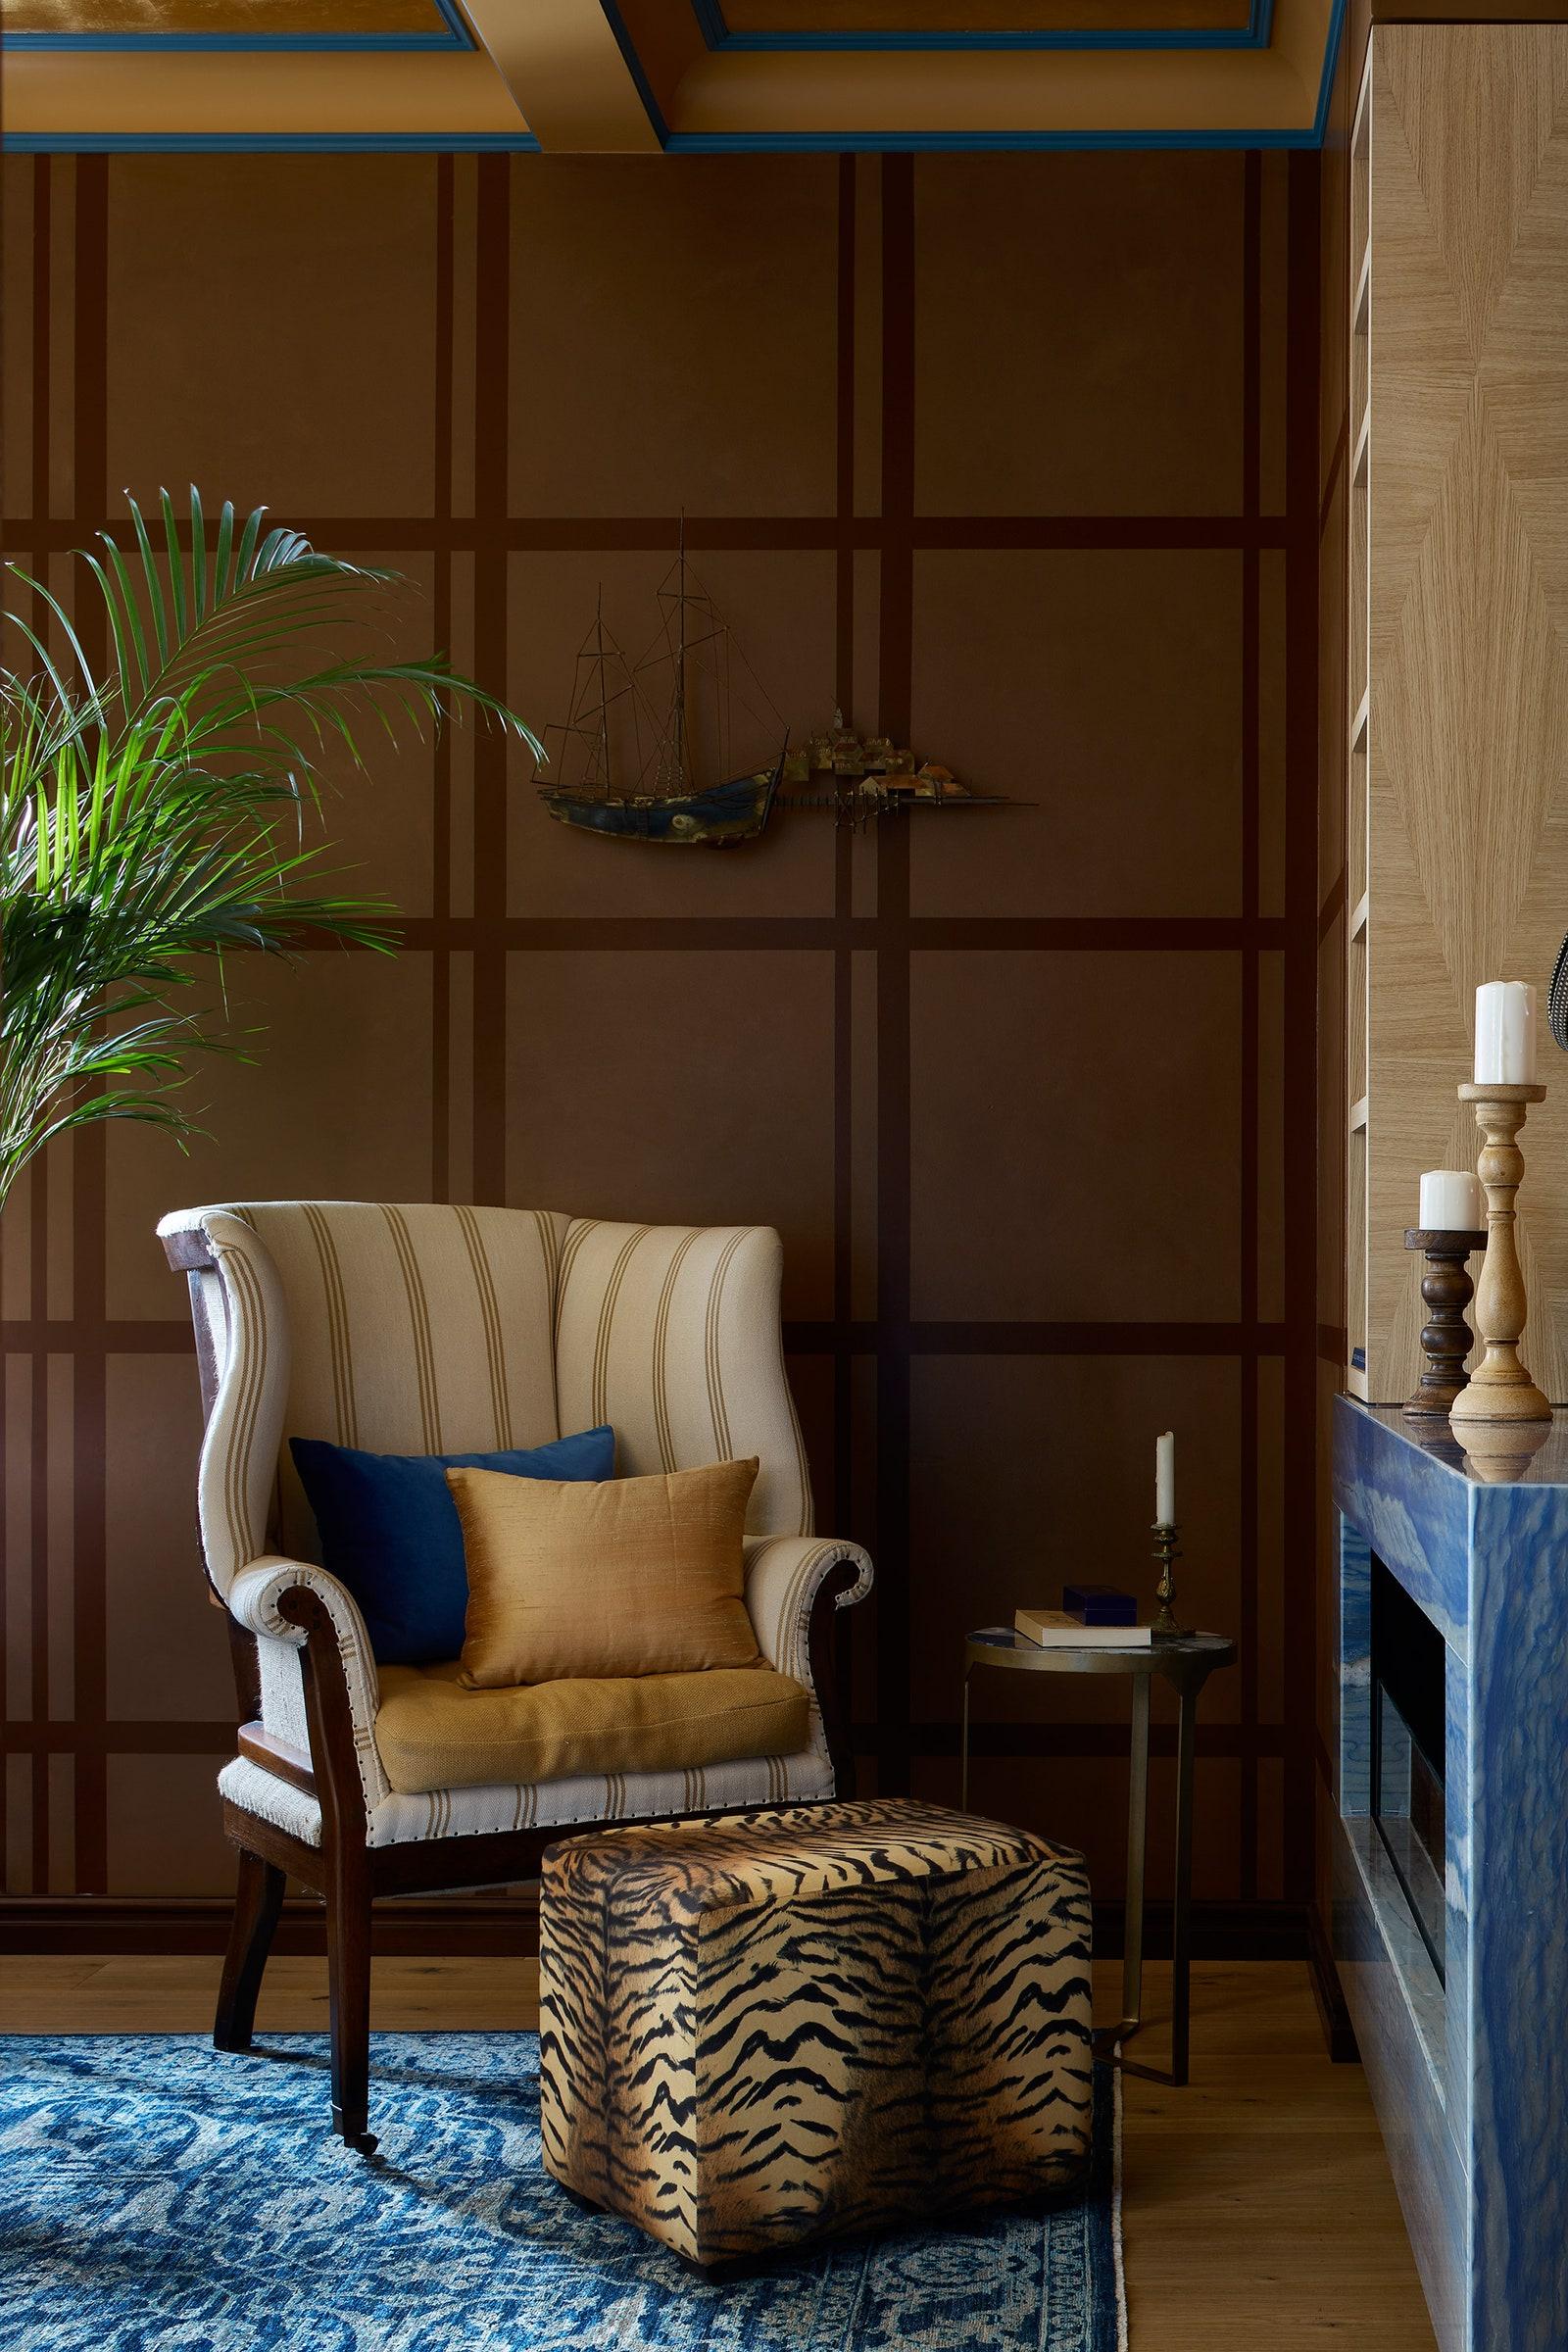 .  Ralph Lauren Home  Loffilab  Art de Vivre   .     .                .